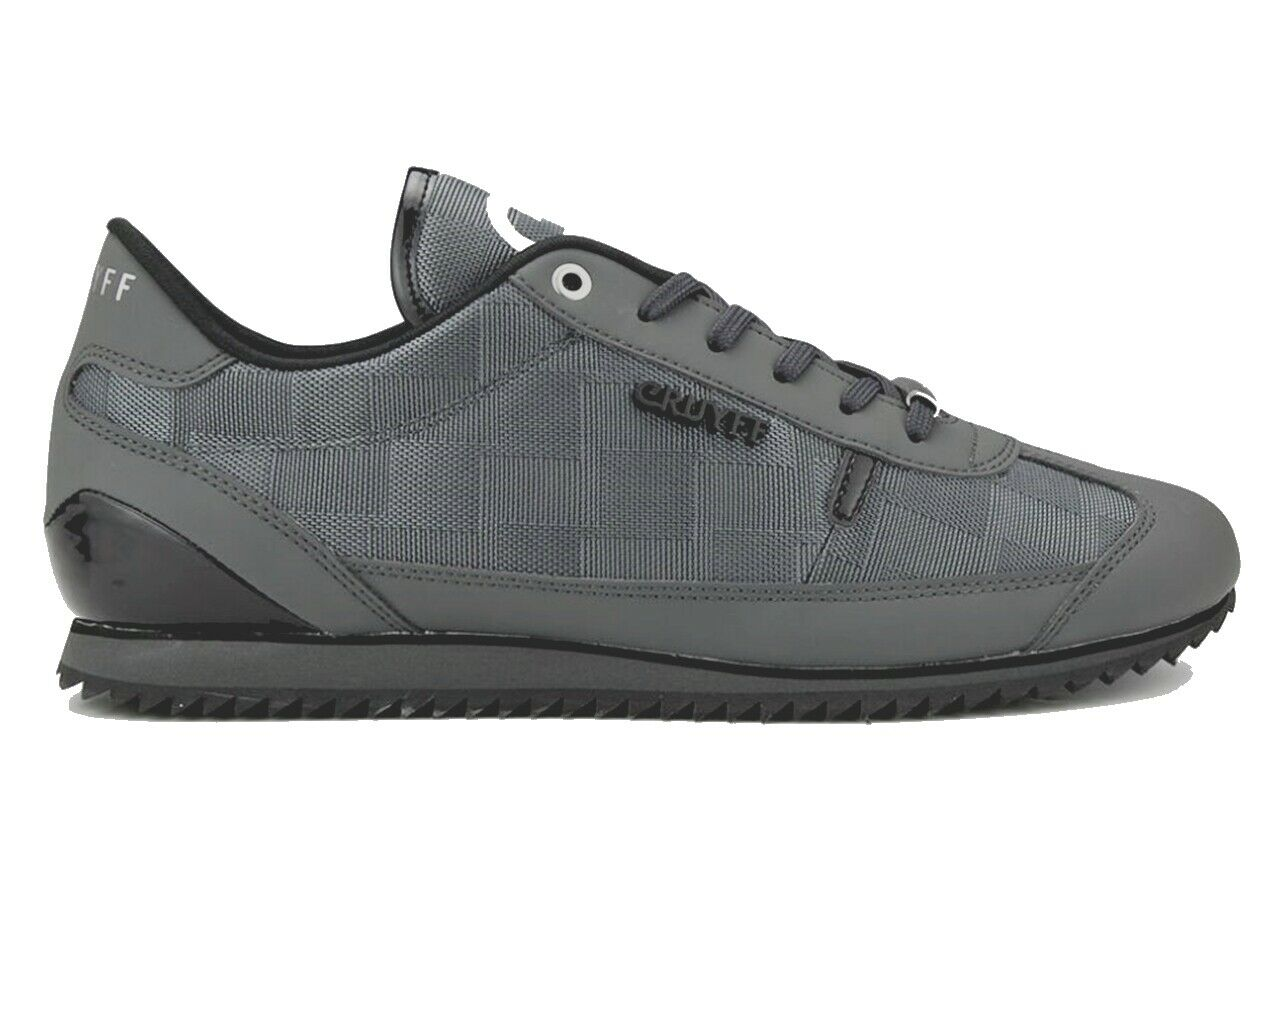 Cruyff Montanya CC7680191480 Lace Up Mens Trainers grau schuhe Turnschuhe